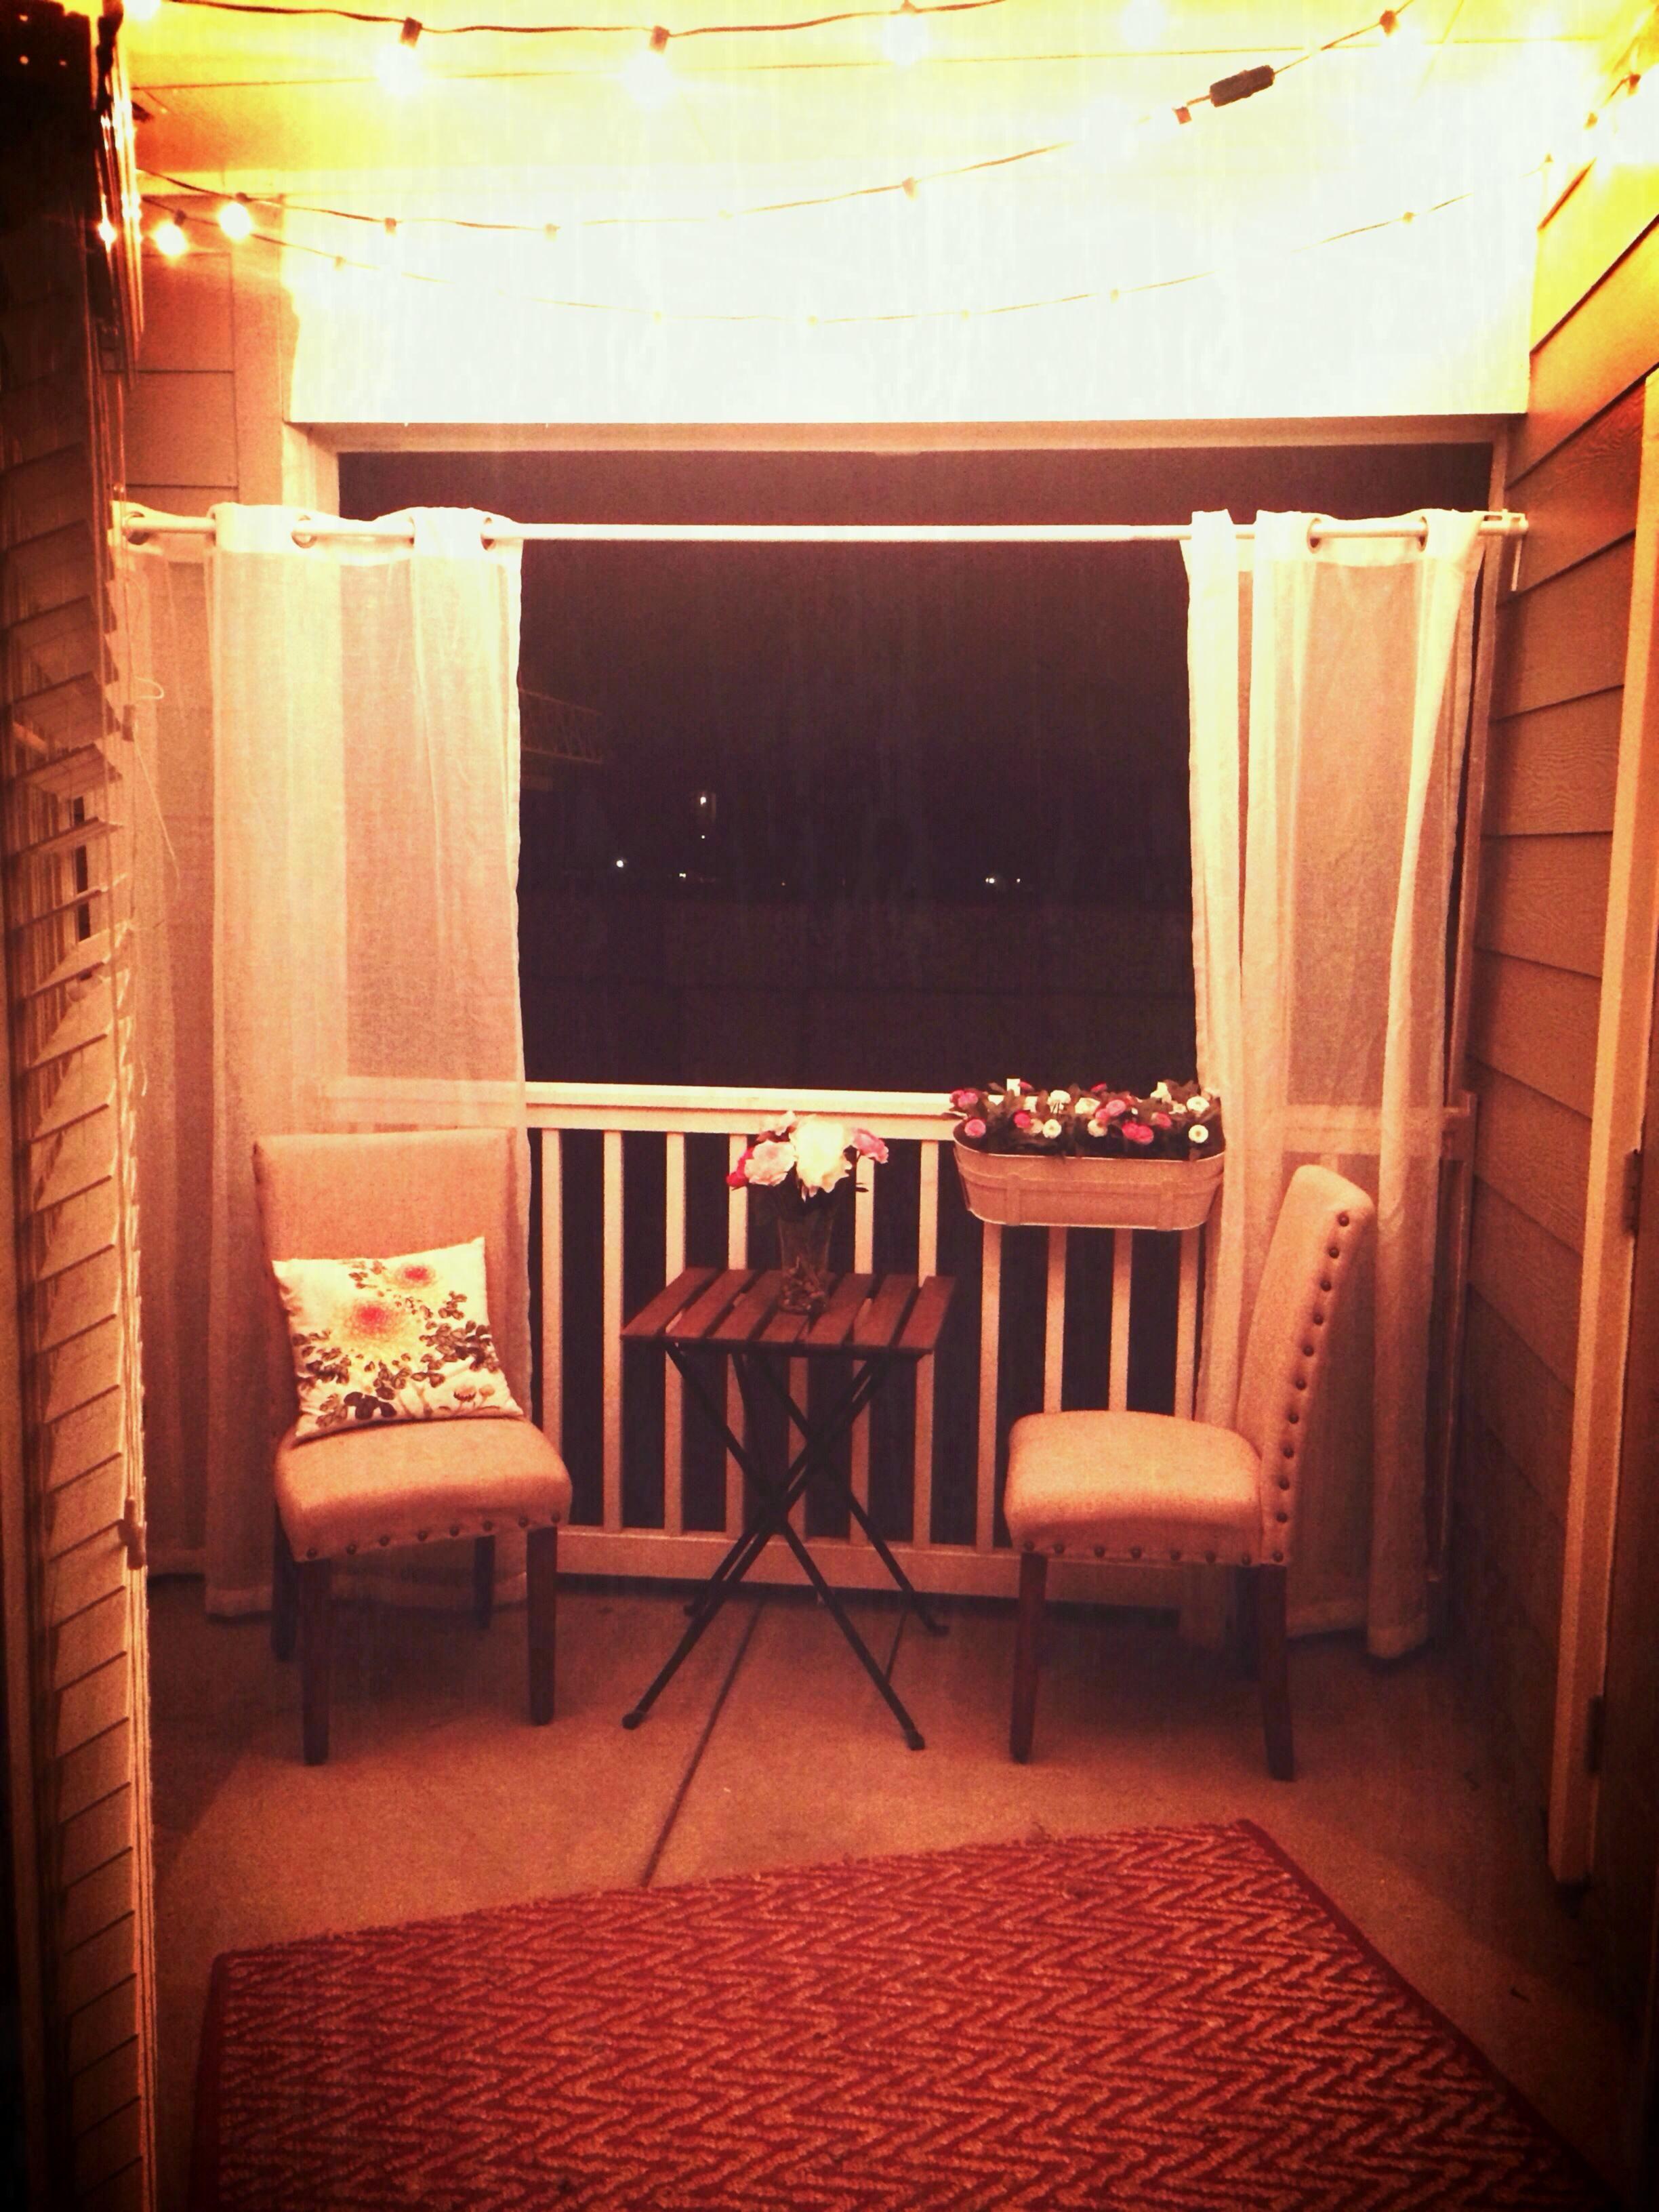 cheap home decor ideas for apartments studio apartment on diy home decor on a budget apartment ideas id=48825